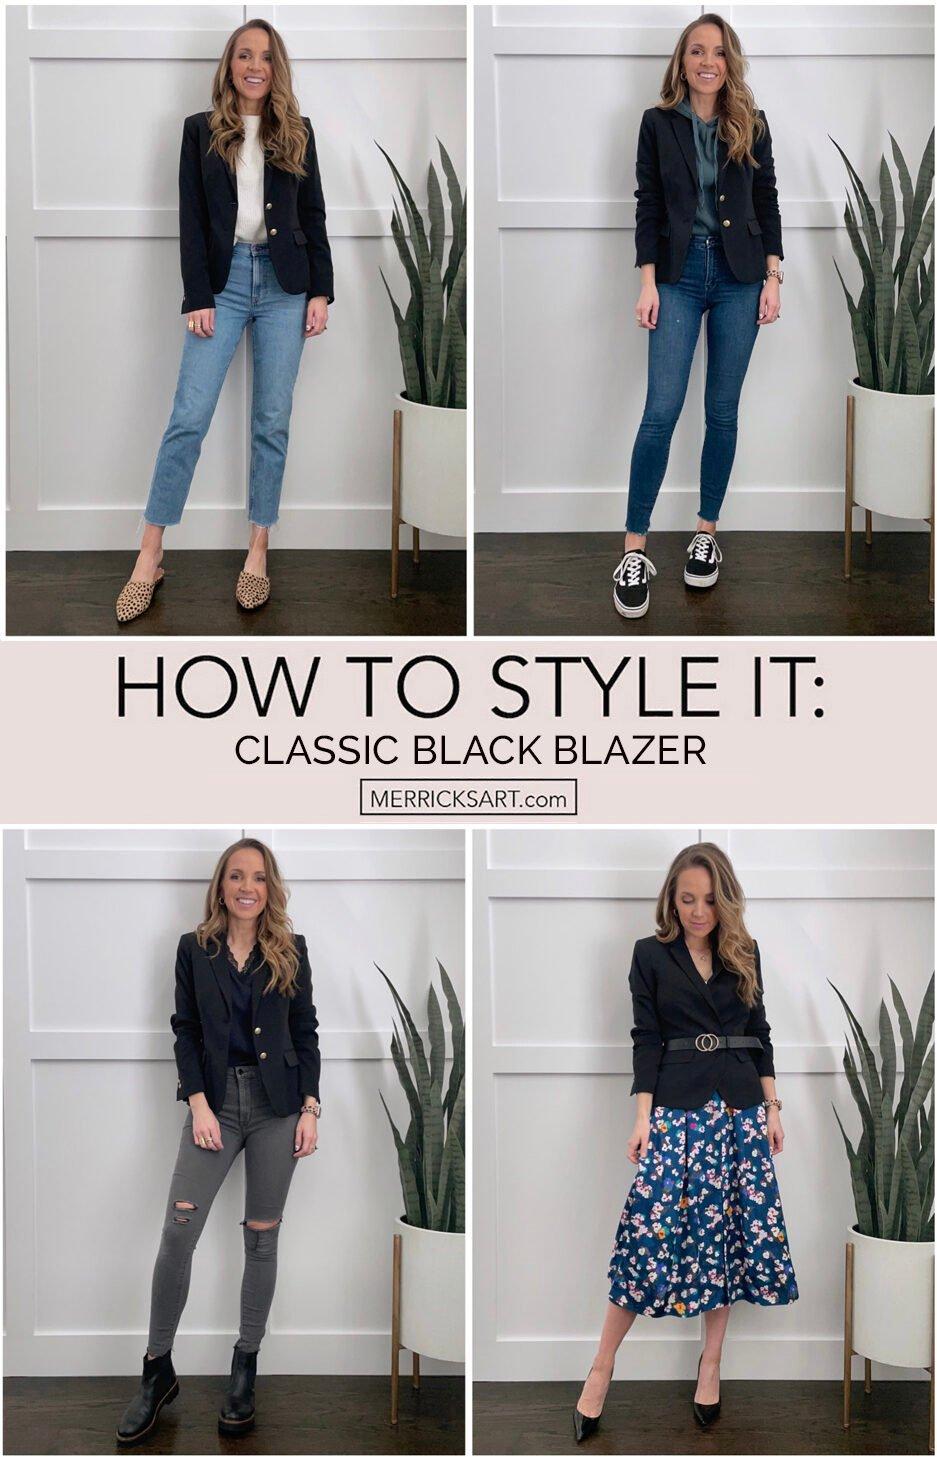 black blazer outfit ideas